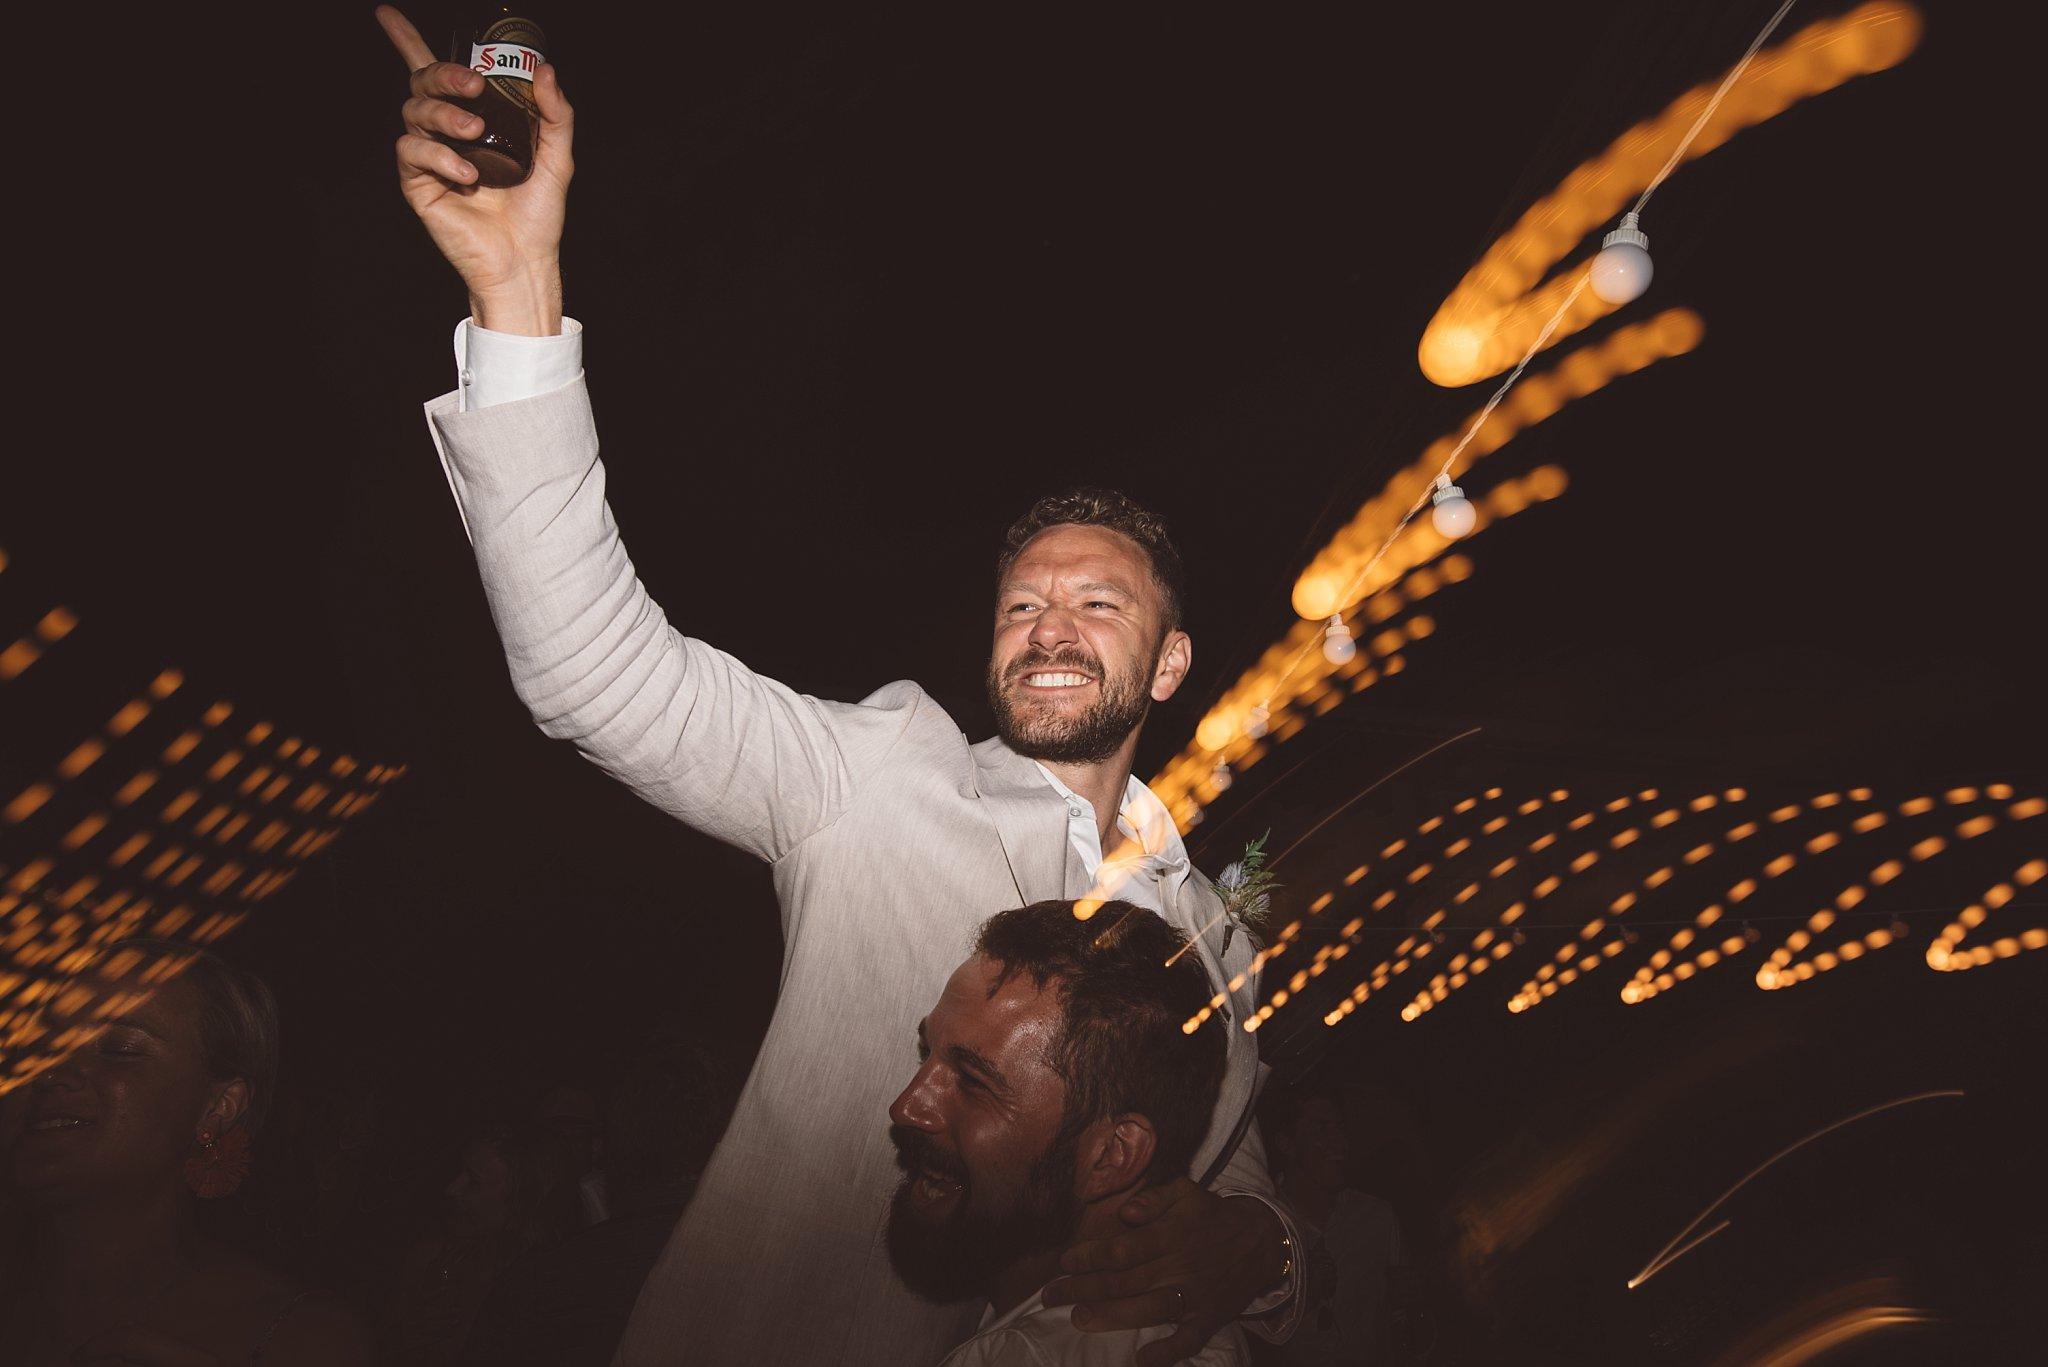 dragging the shutter Ibiza wedding reception